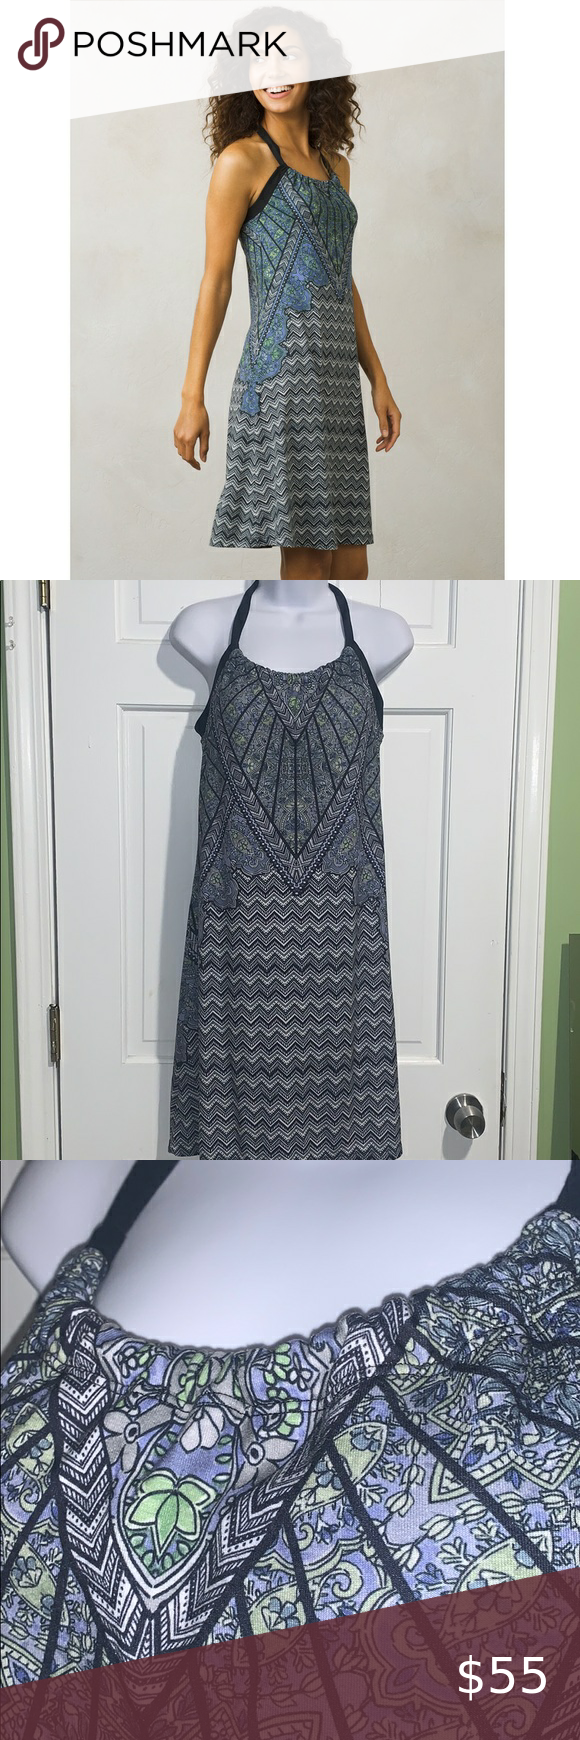 Prana Quinn Athletic Dress Athletic Dress Dresses Tank Top Dress [ 1740 x 580 Pixel ]